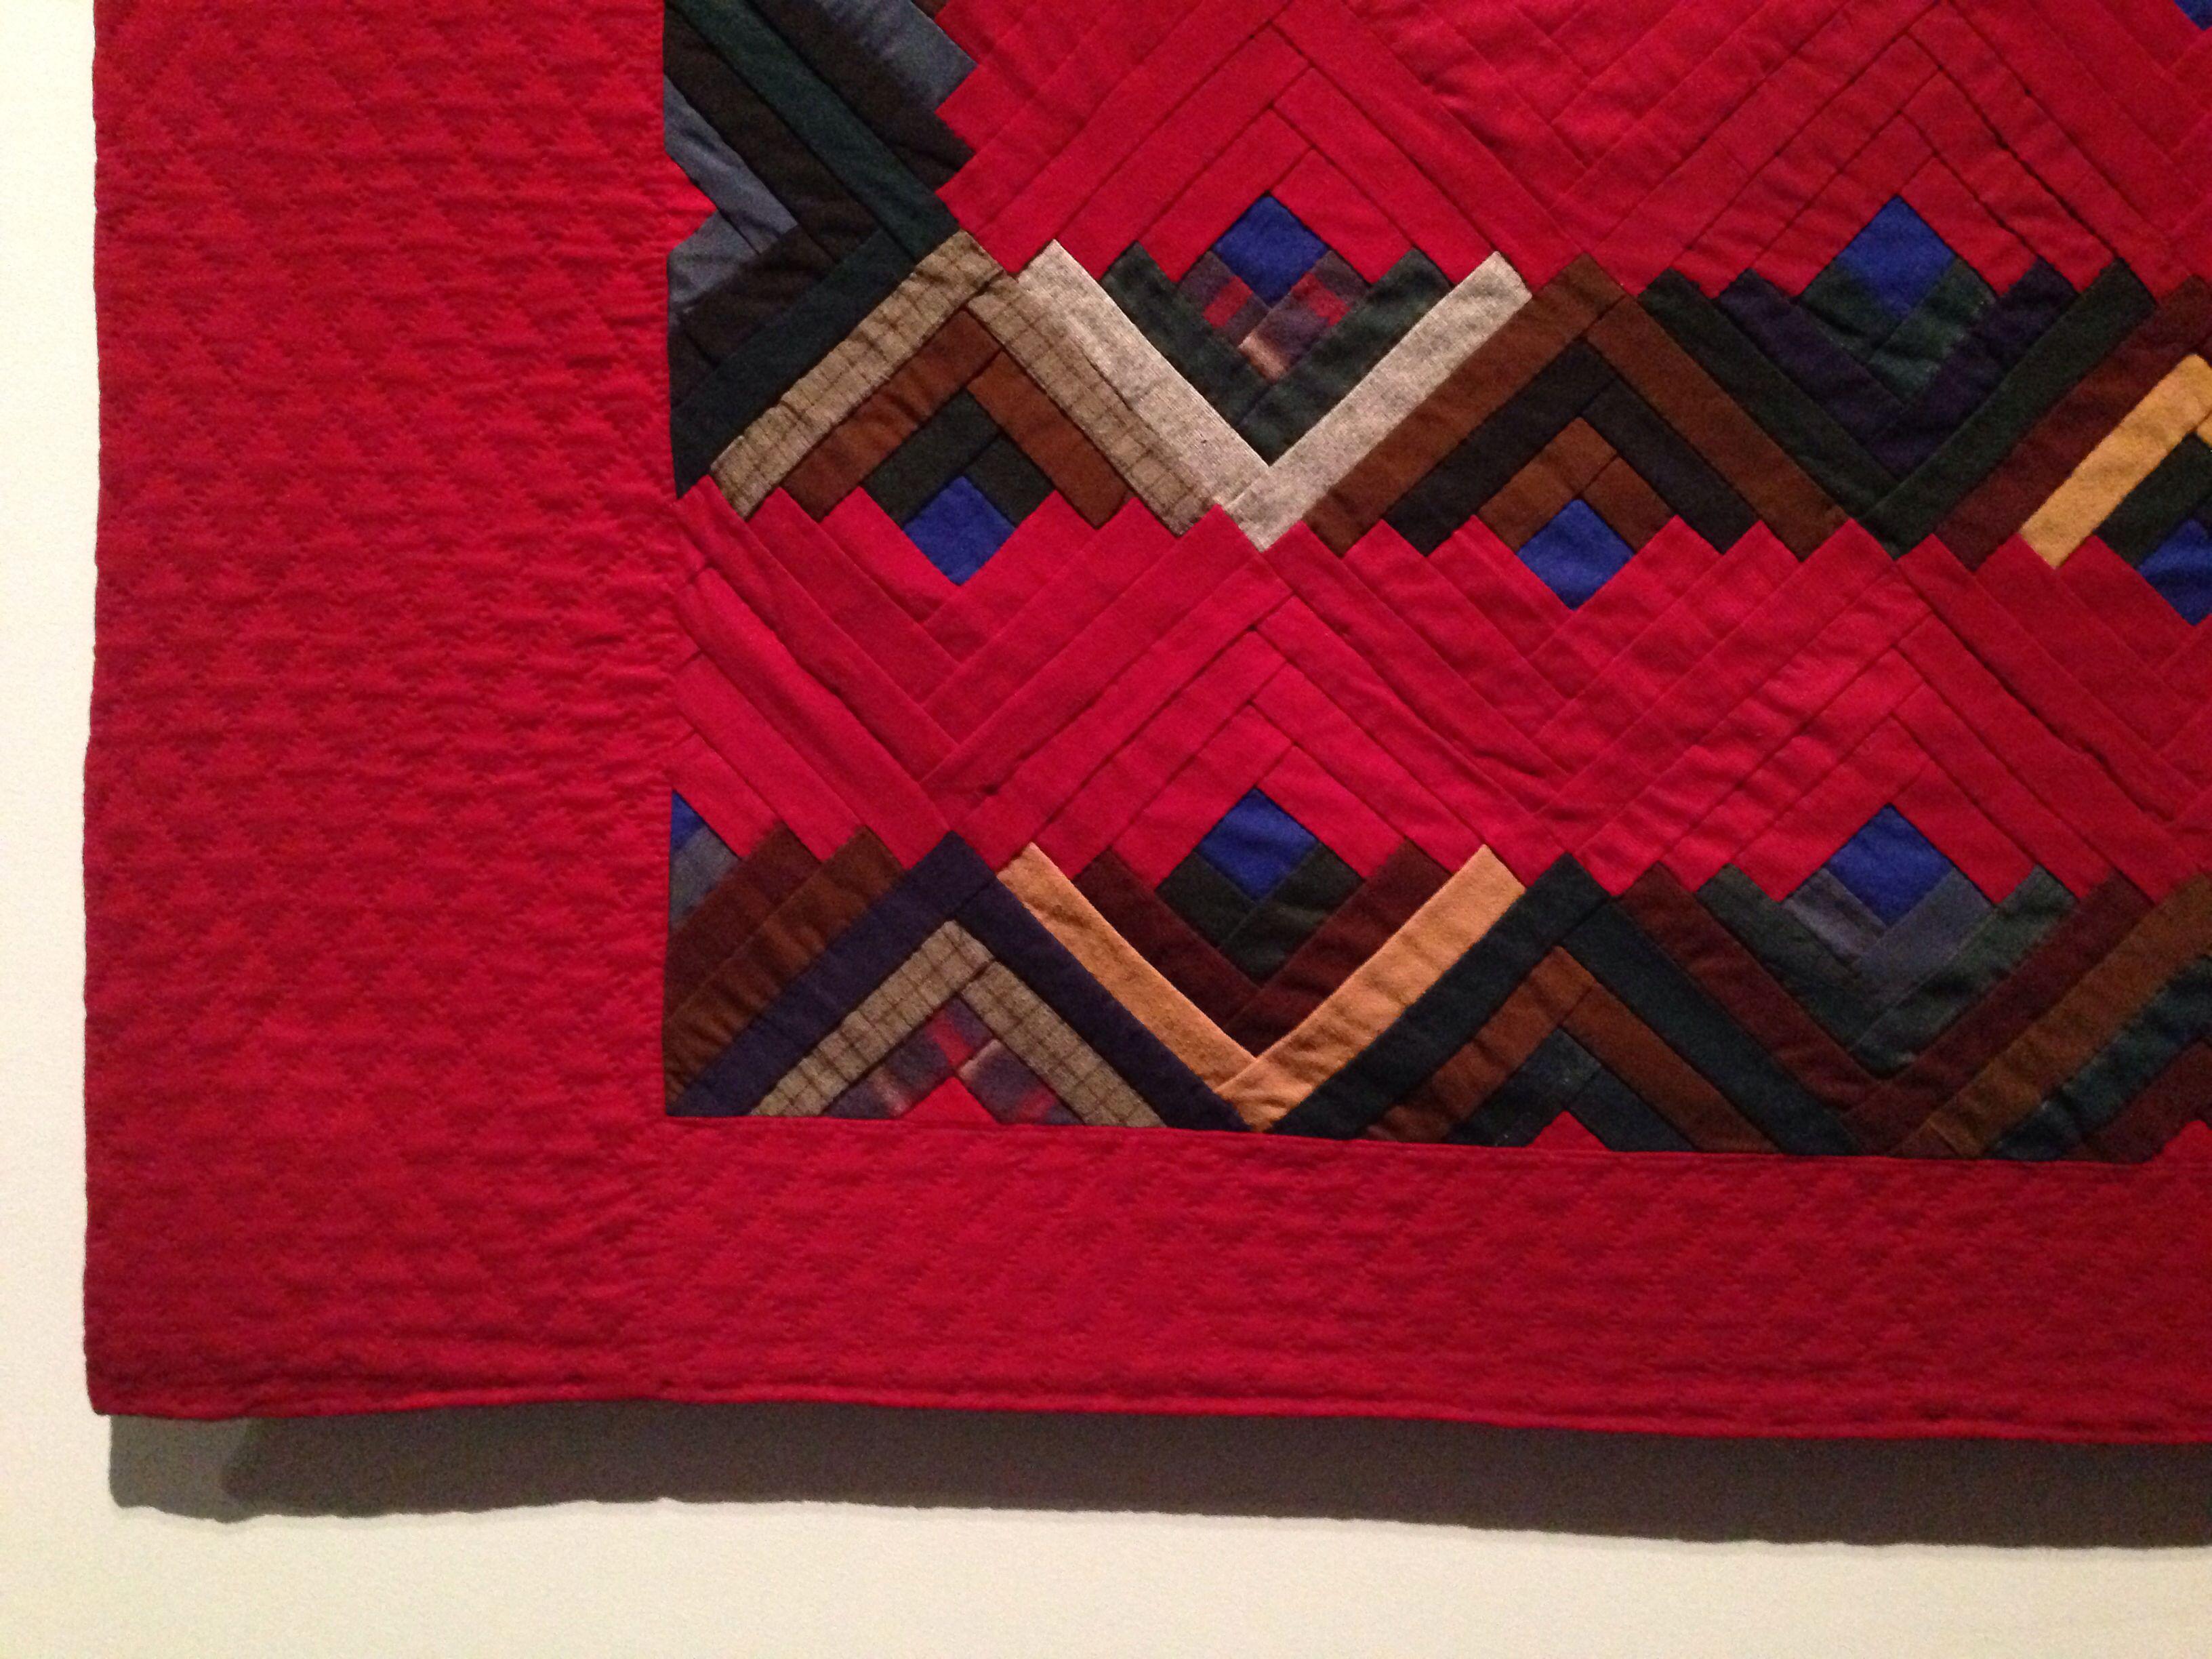 Pin By Josh Dreyfus On Tactile Color Quilts Quilts Color Decor